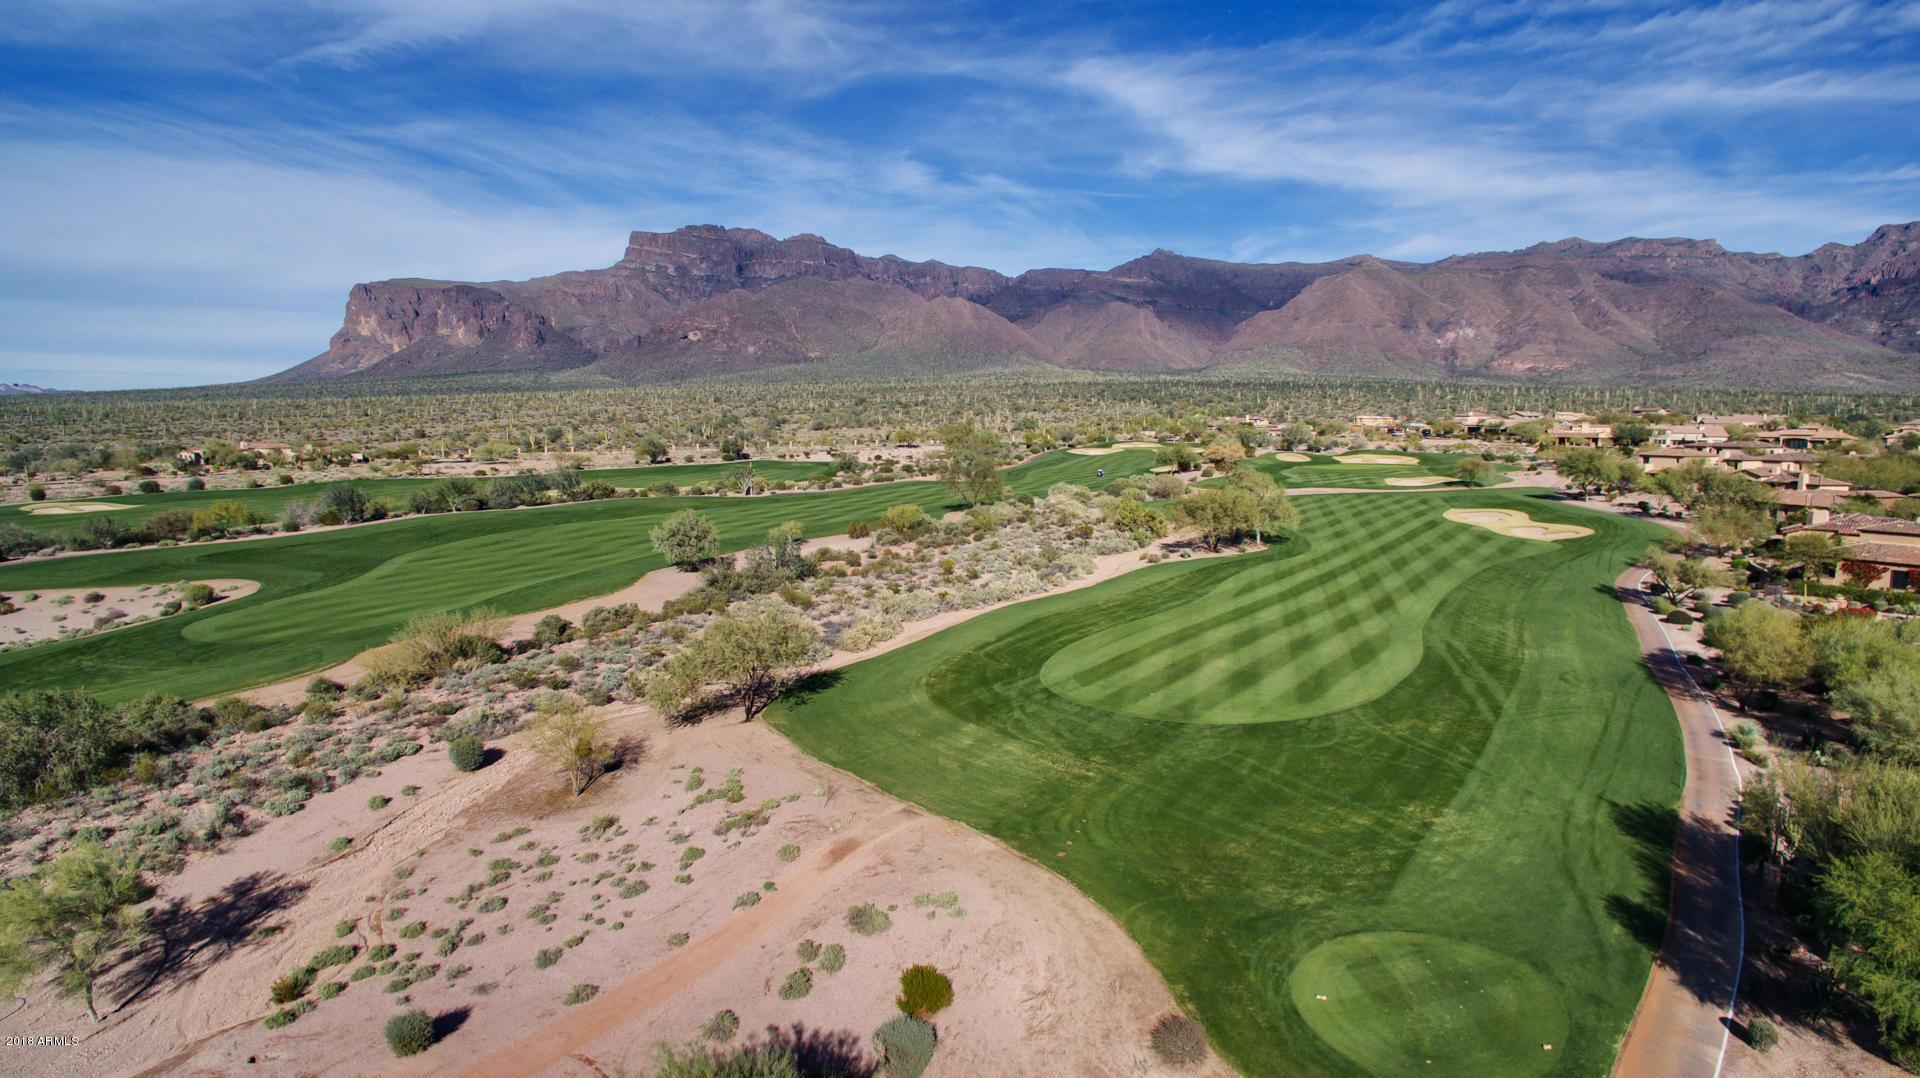 MLS 5857326 2769 S LOOKOUT Ridge, Gold Canyon, AZ 85118 Gold Canyon AZ Condo or Townhome